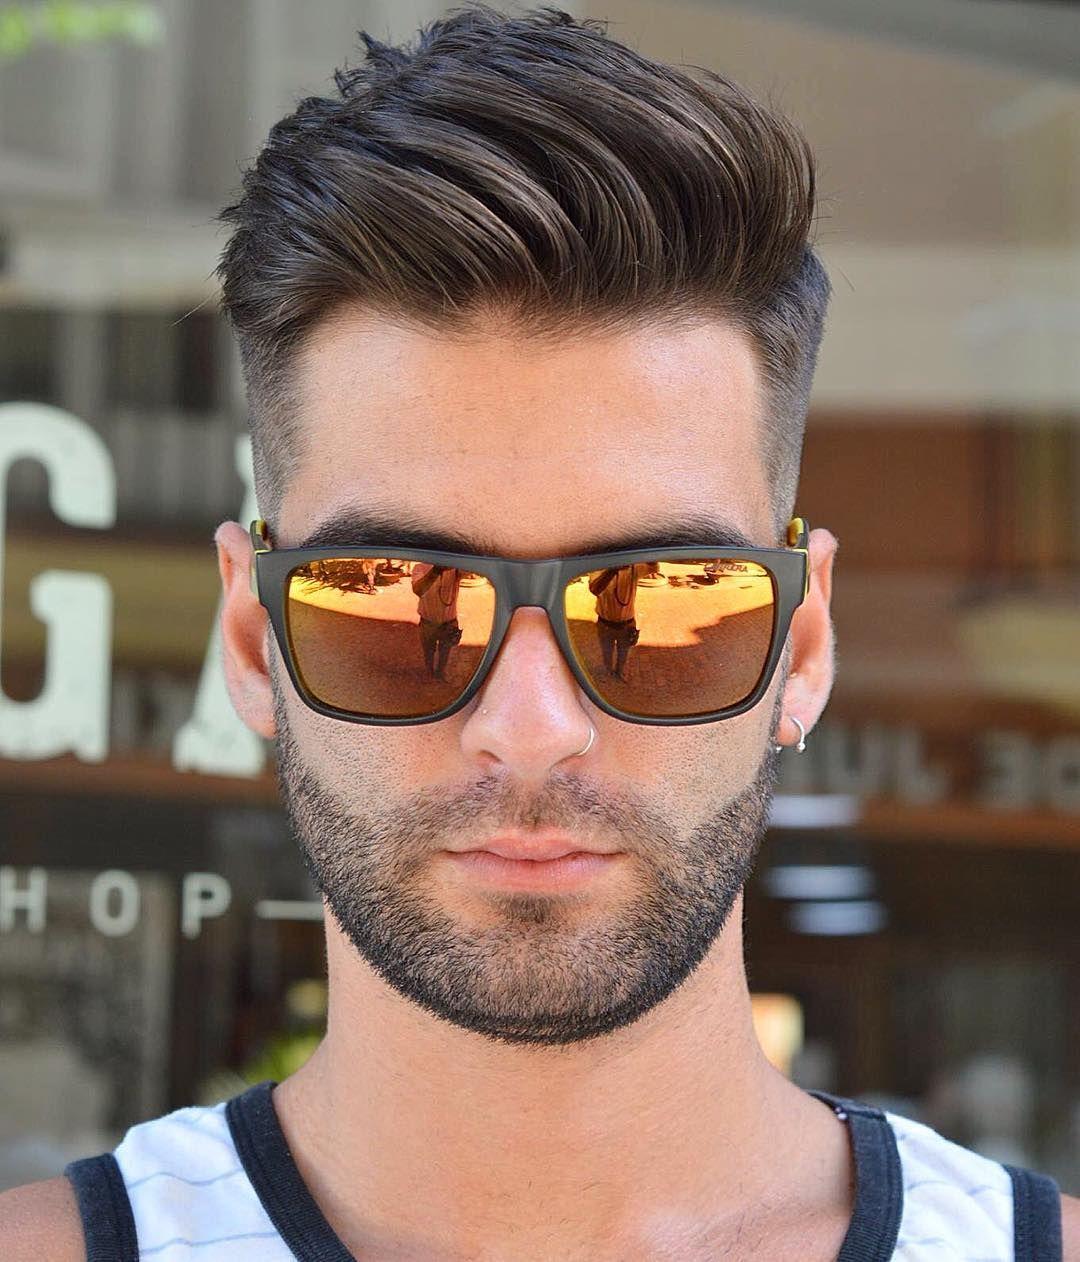 100+ new men's hairstyles (top picks) | hairstyle | hair